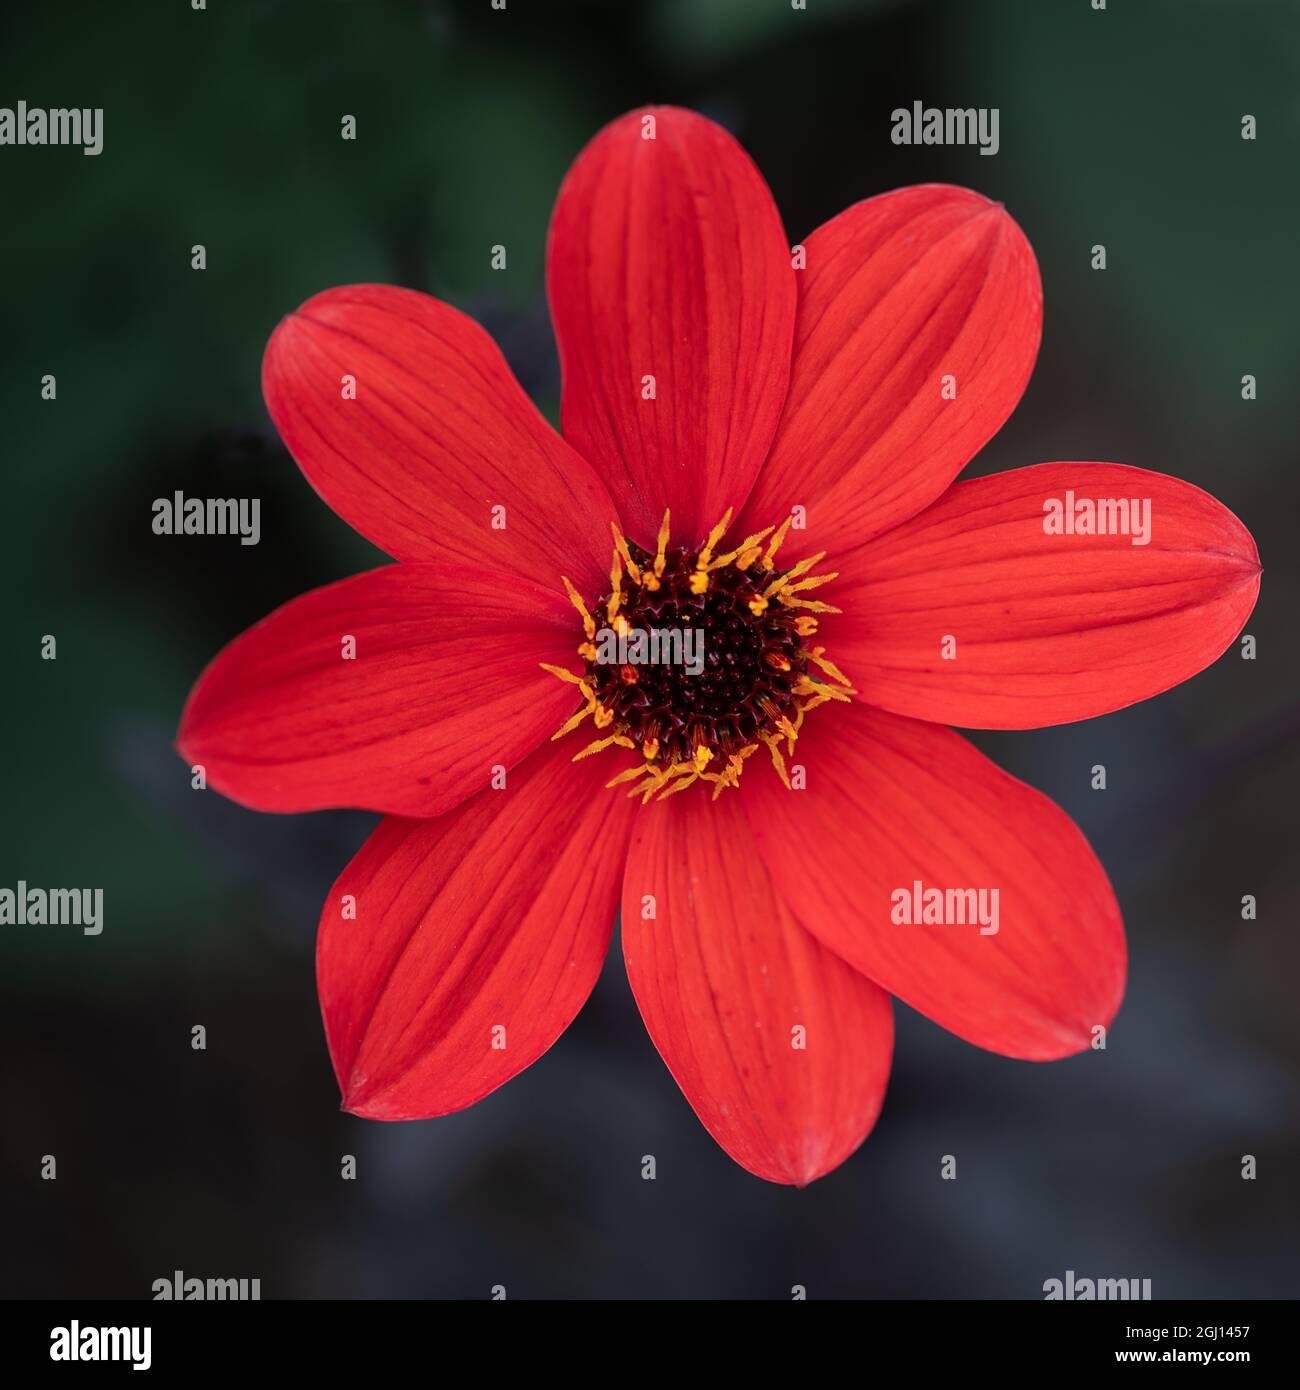 Closeup of the 'Bishop of Llandaff', a cultivar of the dahlia, a garden plant Stock Photo